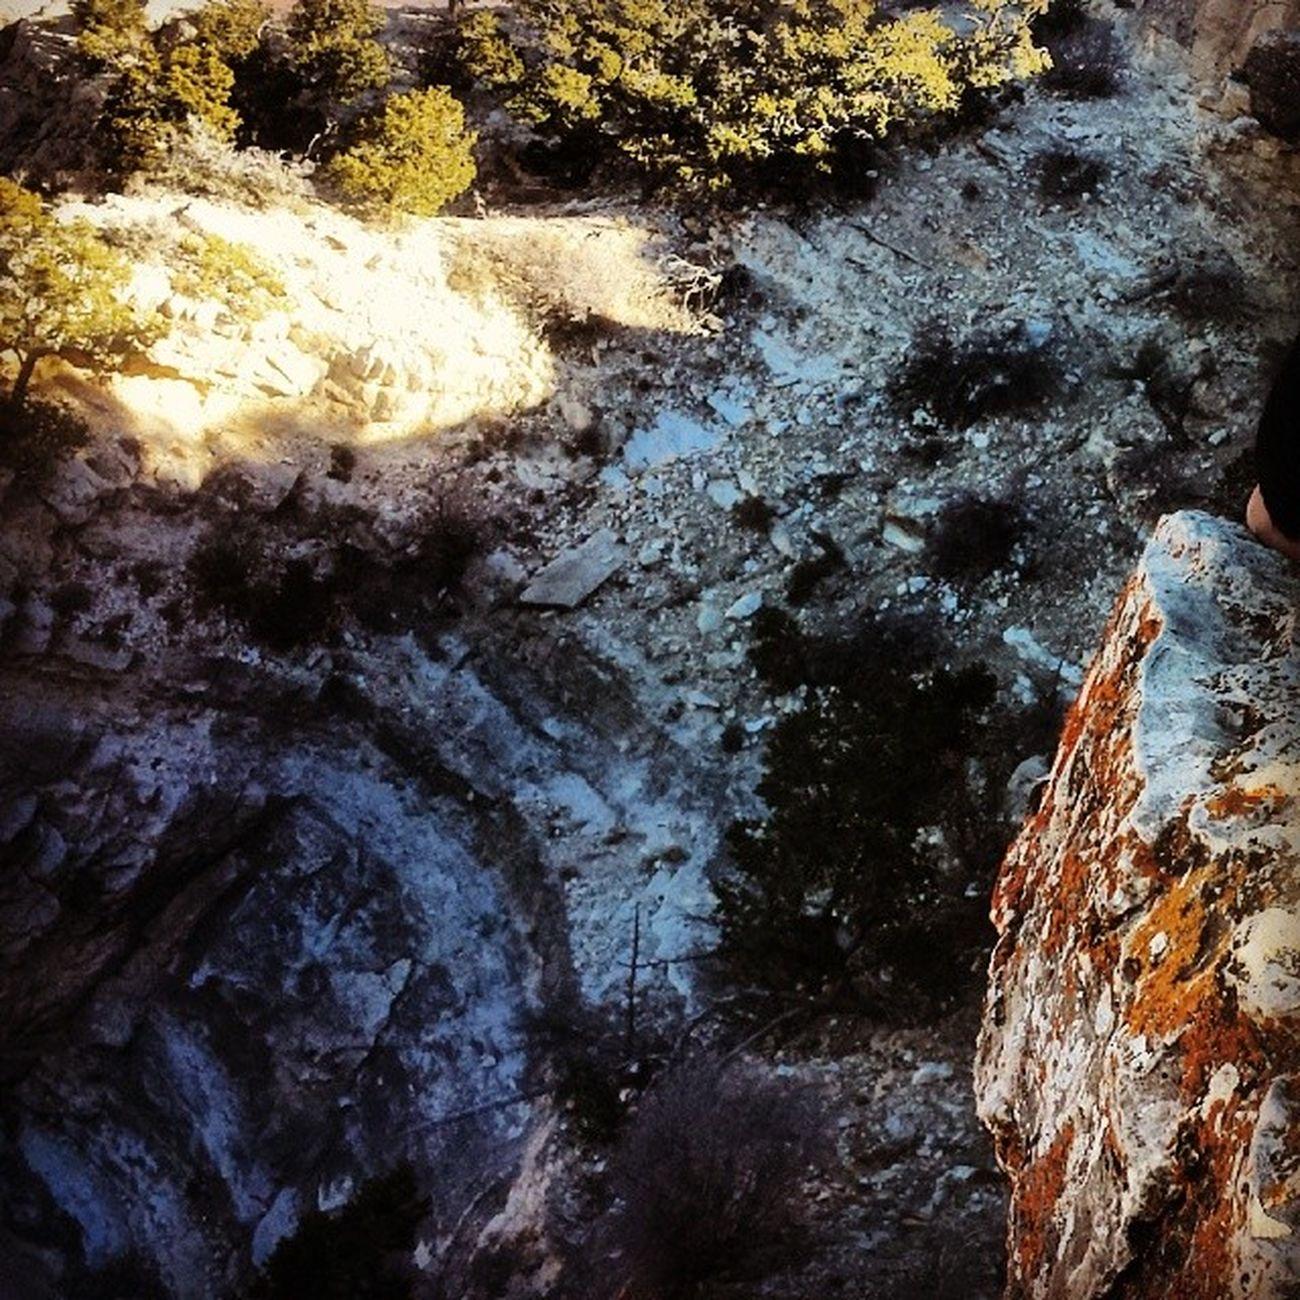 Ty on a ledge pt. 2 Roadtrip Couplesweekend Mountains Canyon coloradoriver tyler tk boof hole ledge cliff fallingoffcliff falling slipping grandcanyonvillage canyon rocks trees